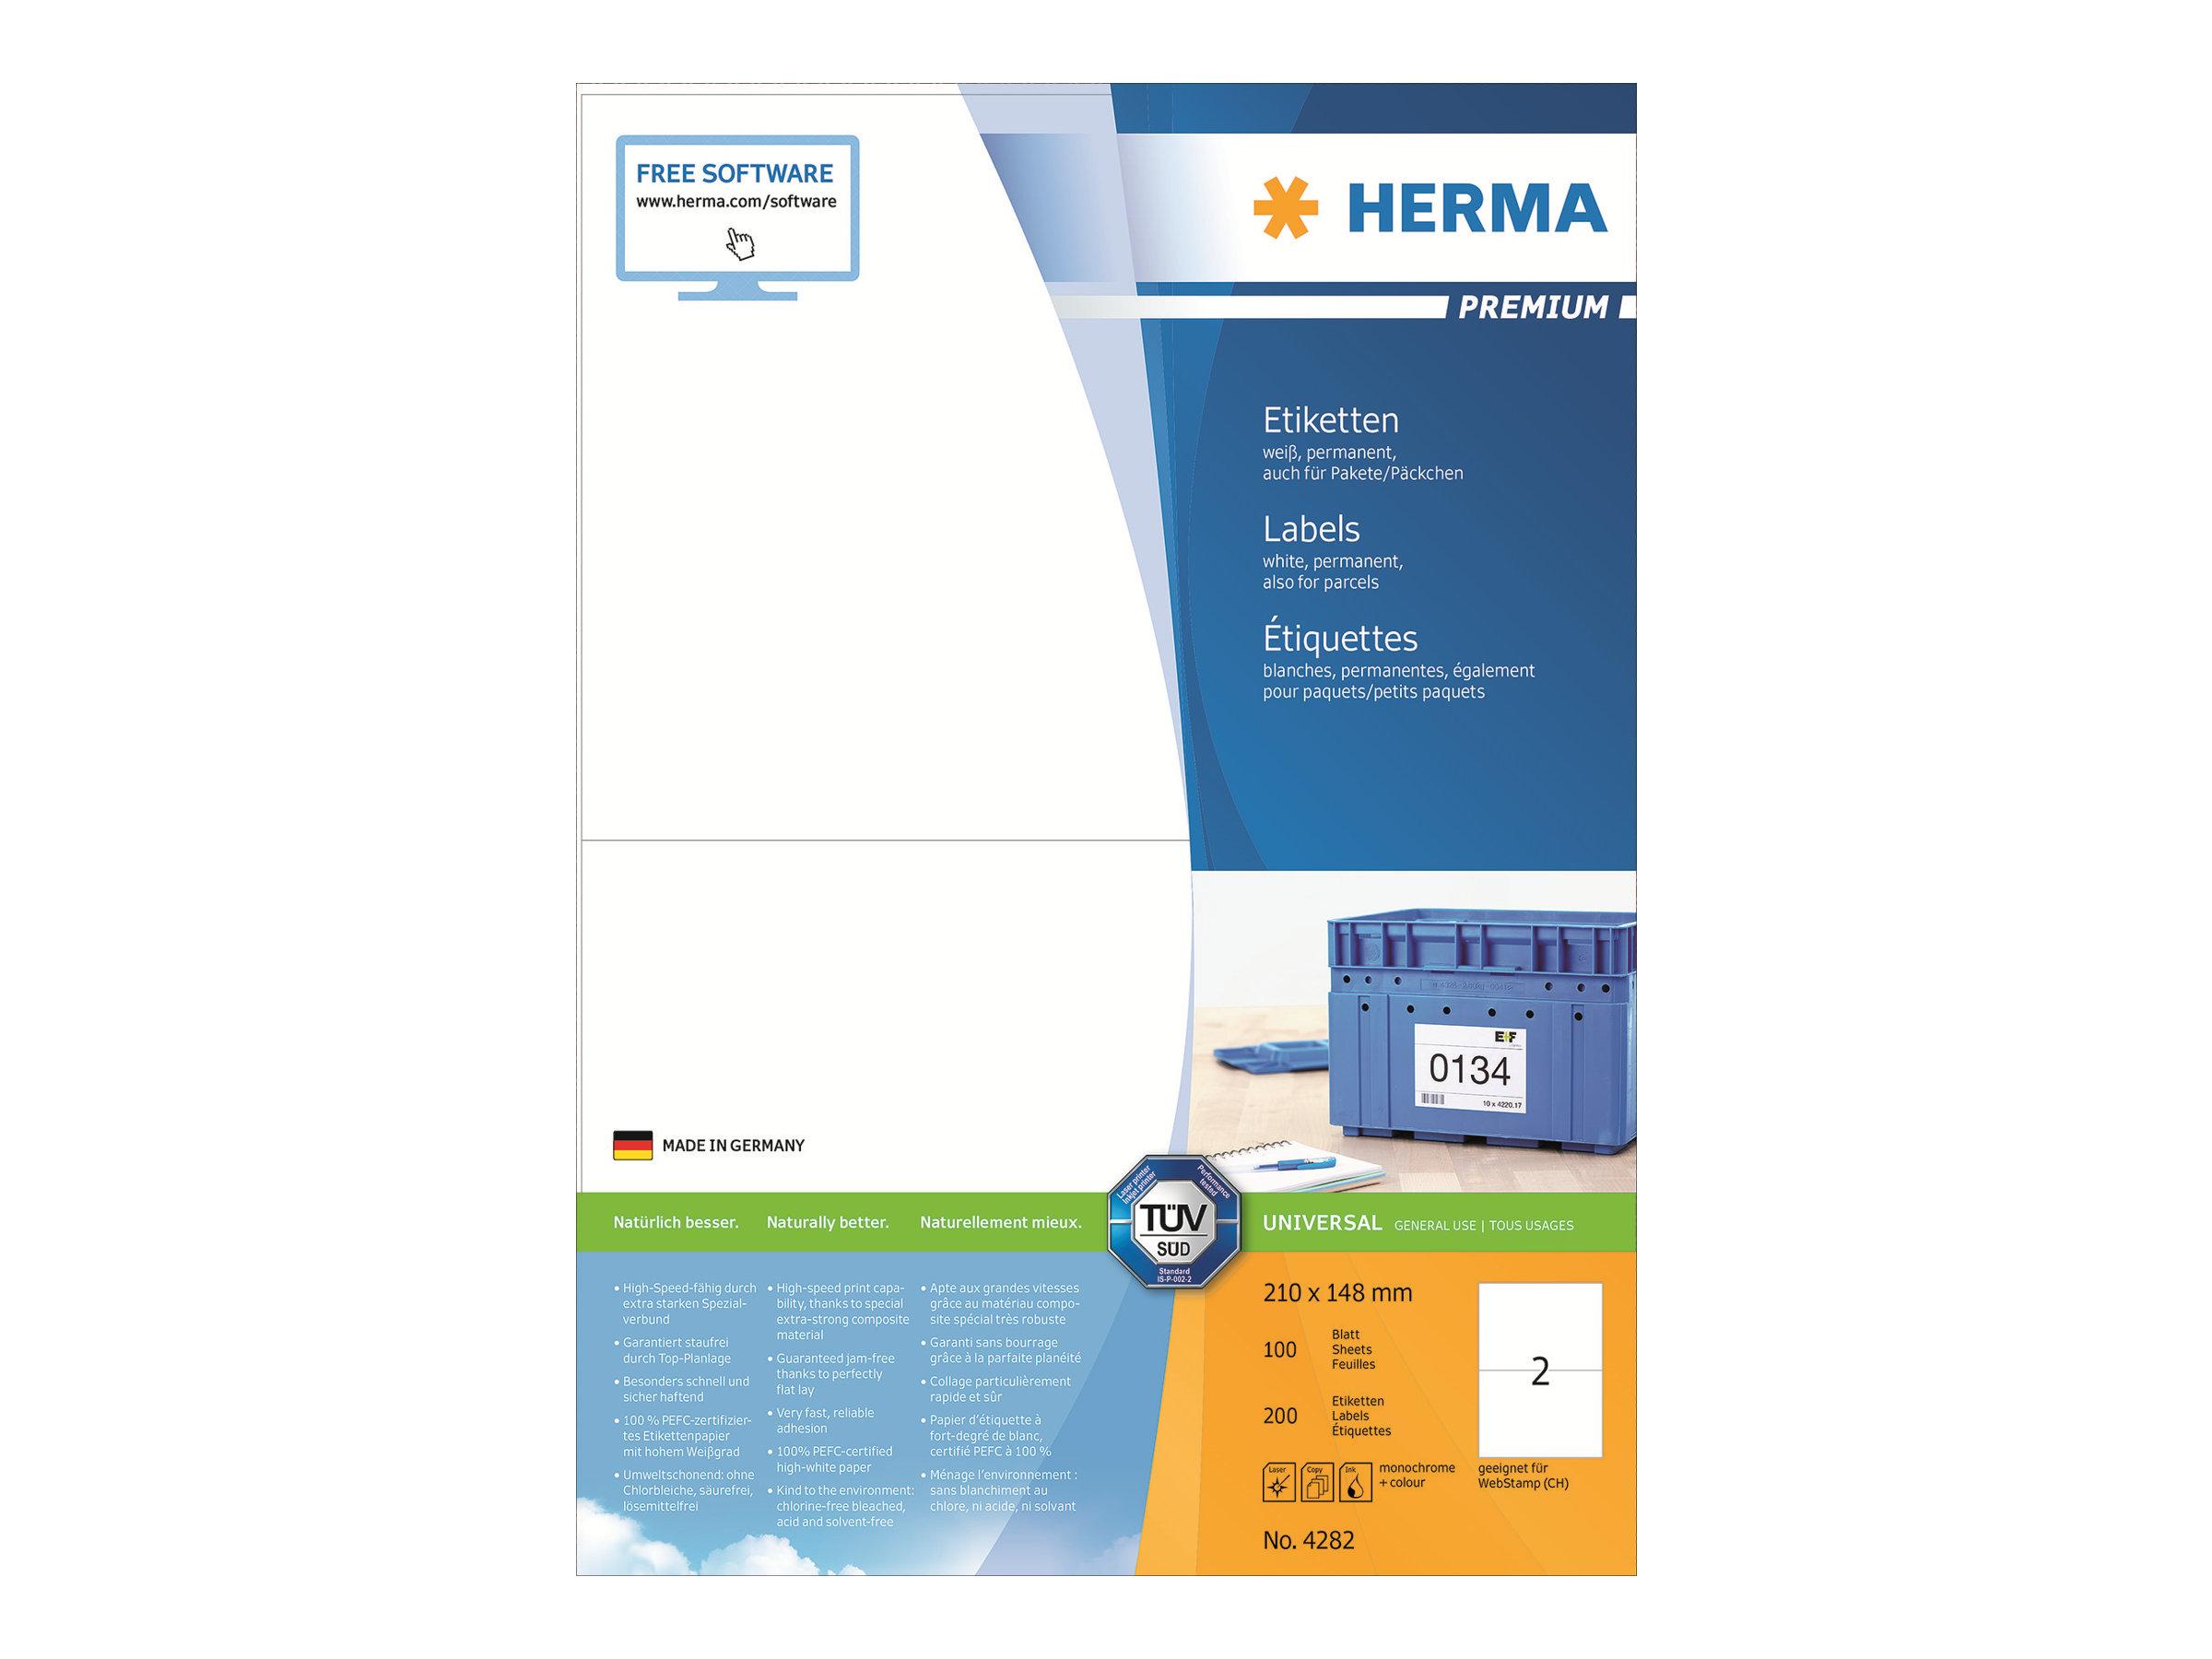 HERMA Premium - Papier - matt - permanent selbstklebend - weiß - A5 (148 x 210 mm)